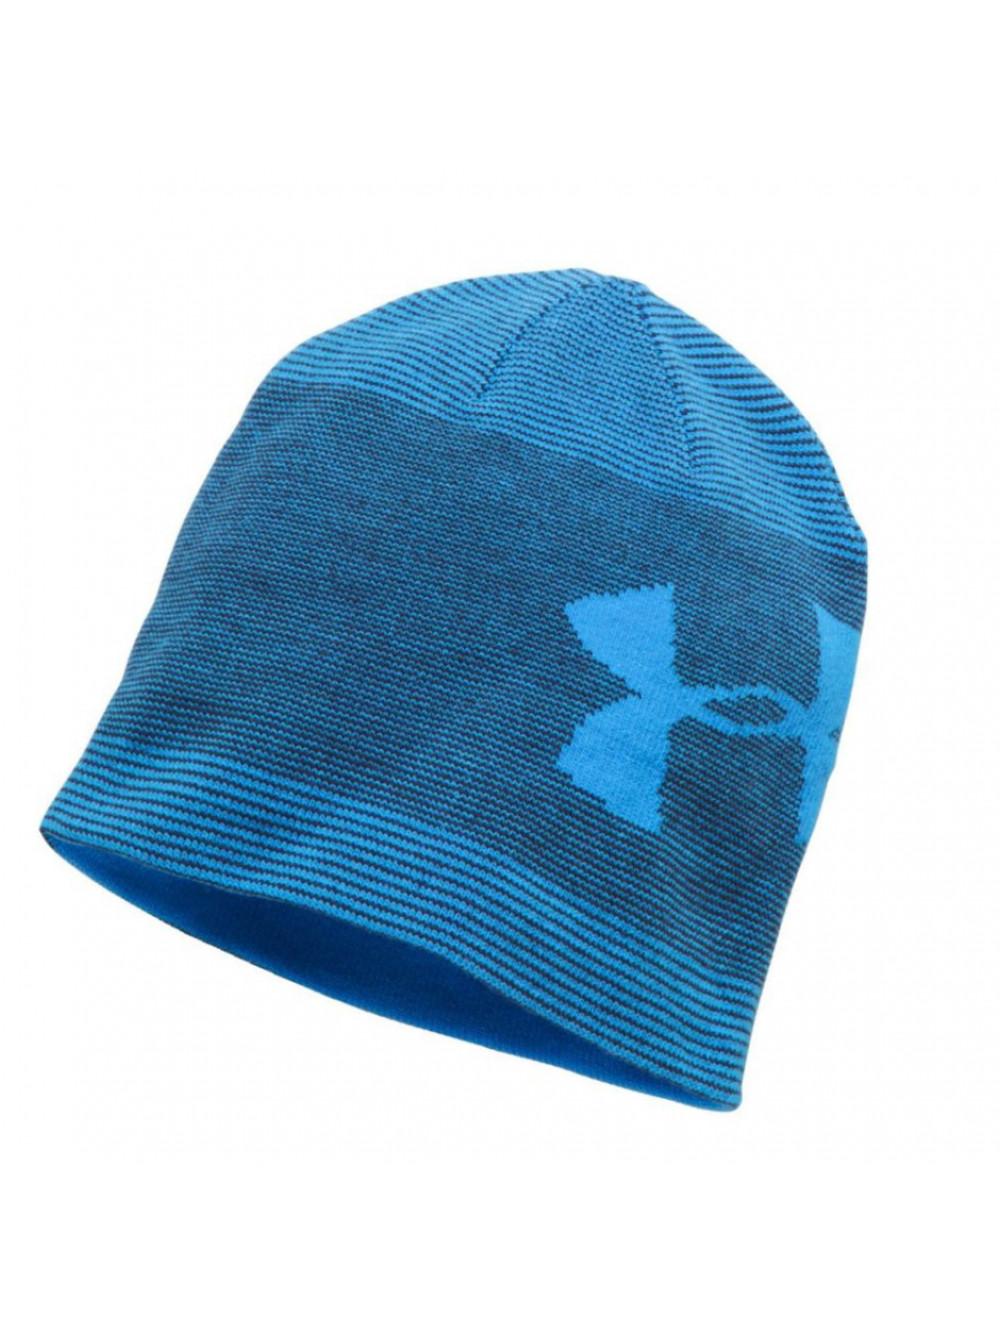 Pánska čiapka Under Armour Men's Billboard Beanie Modrá